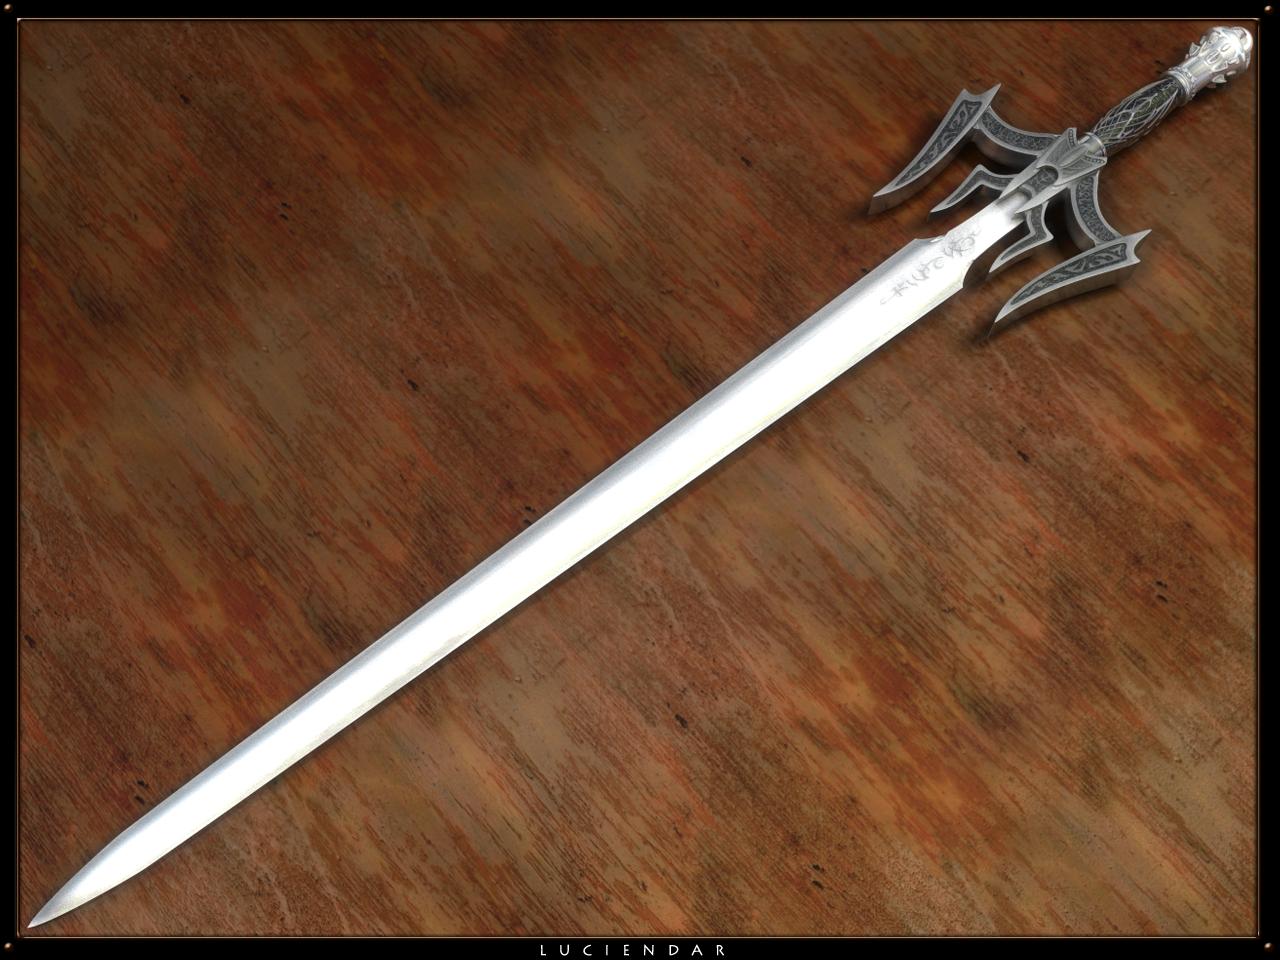 sword of the stars